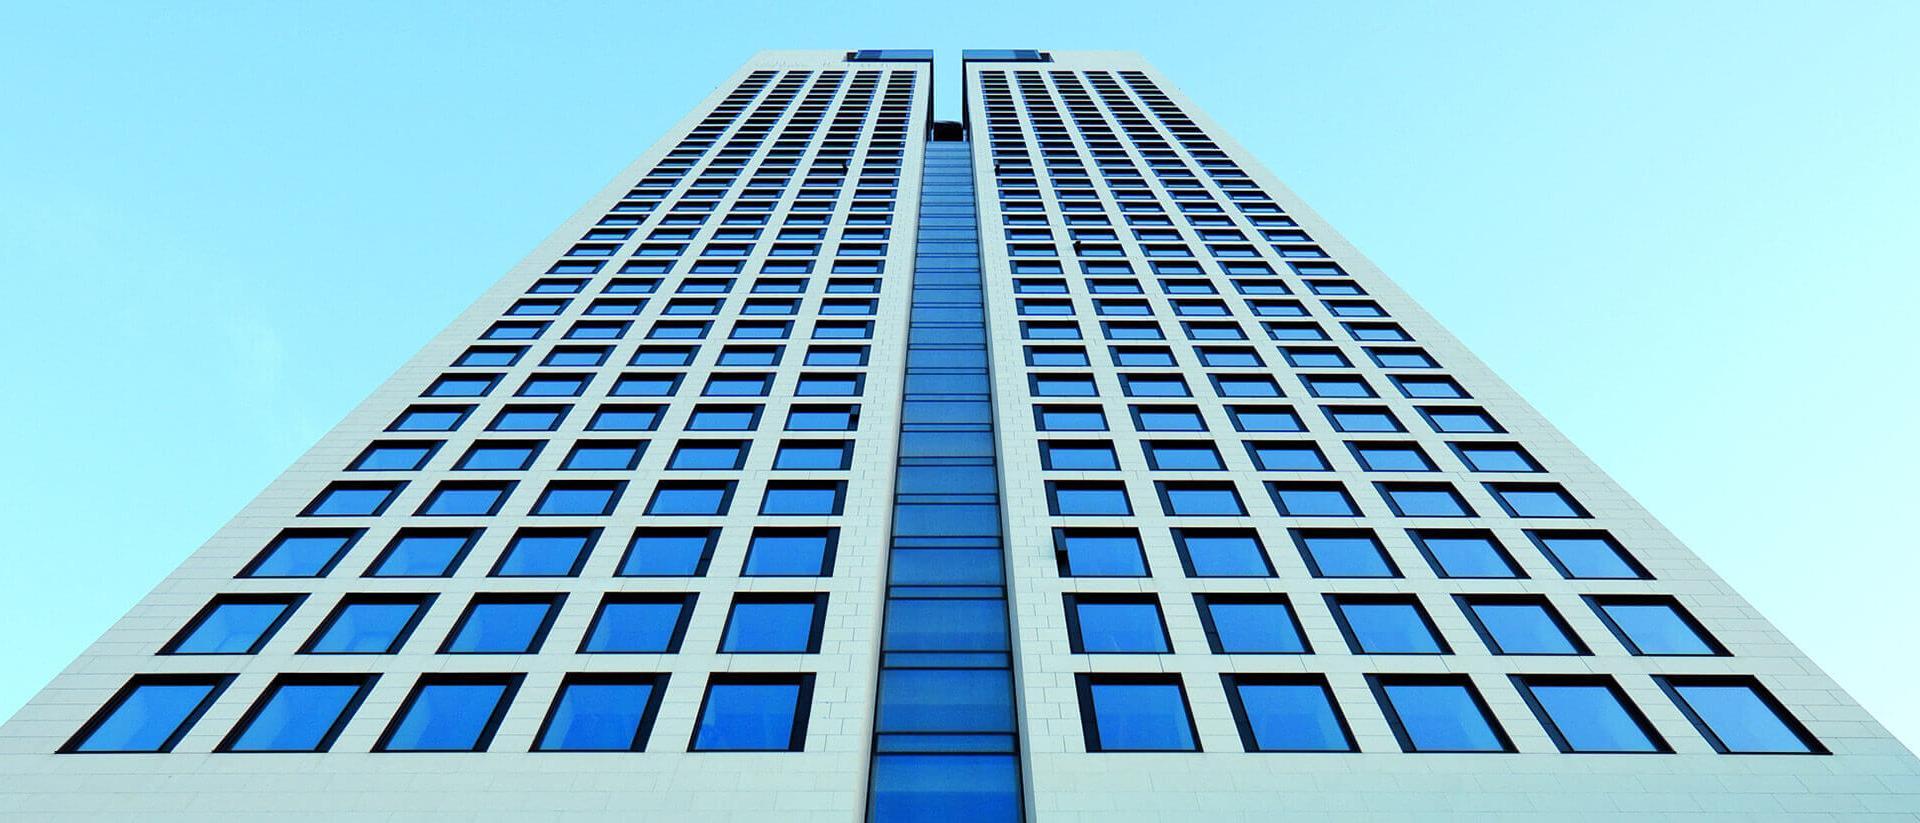 OpernTurm Project Building